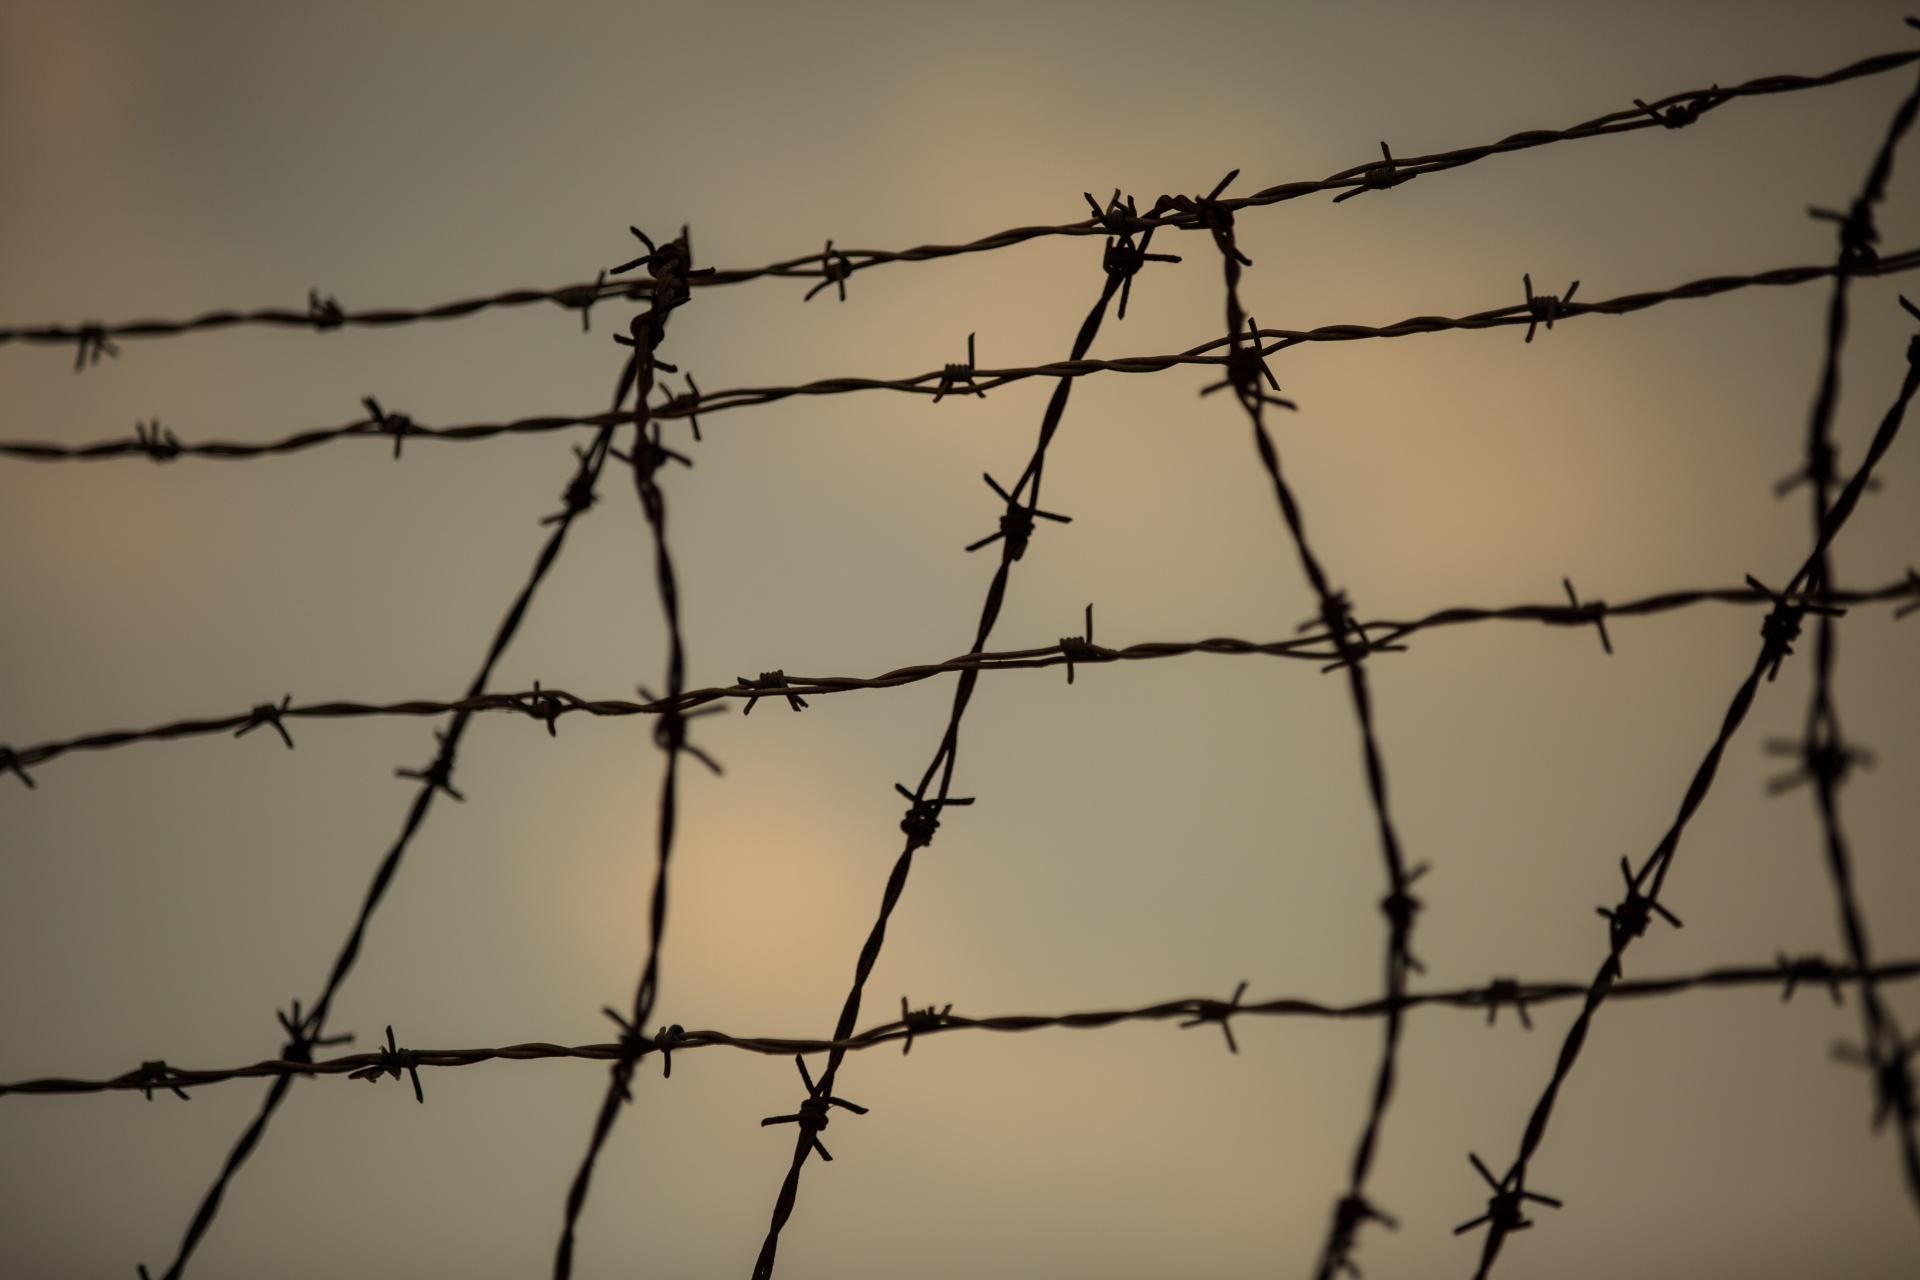 barbed-wire-1467825390ha4.jpg